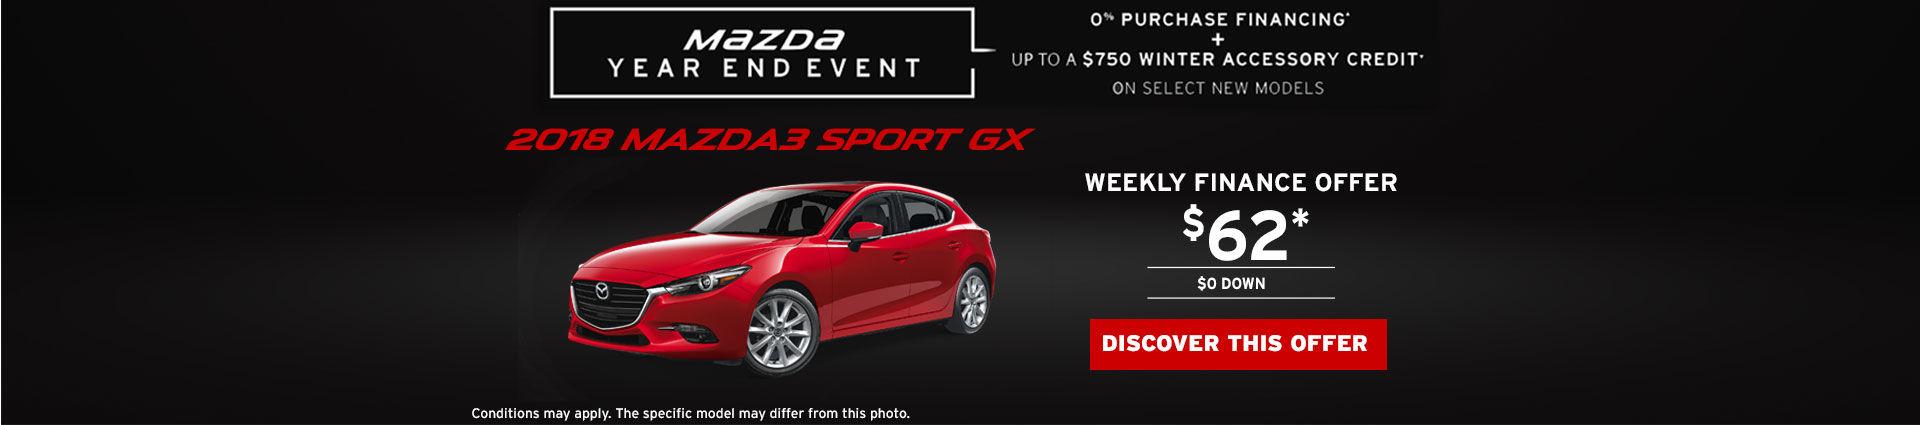 Finance the 2018 Mazda 3 Sport